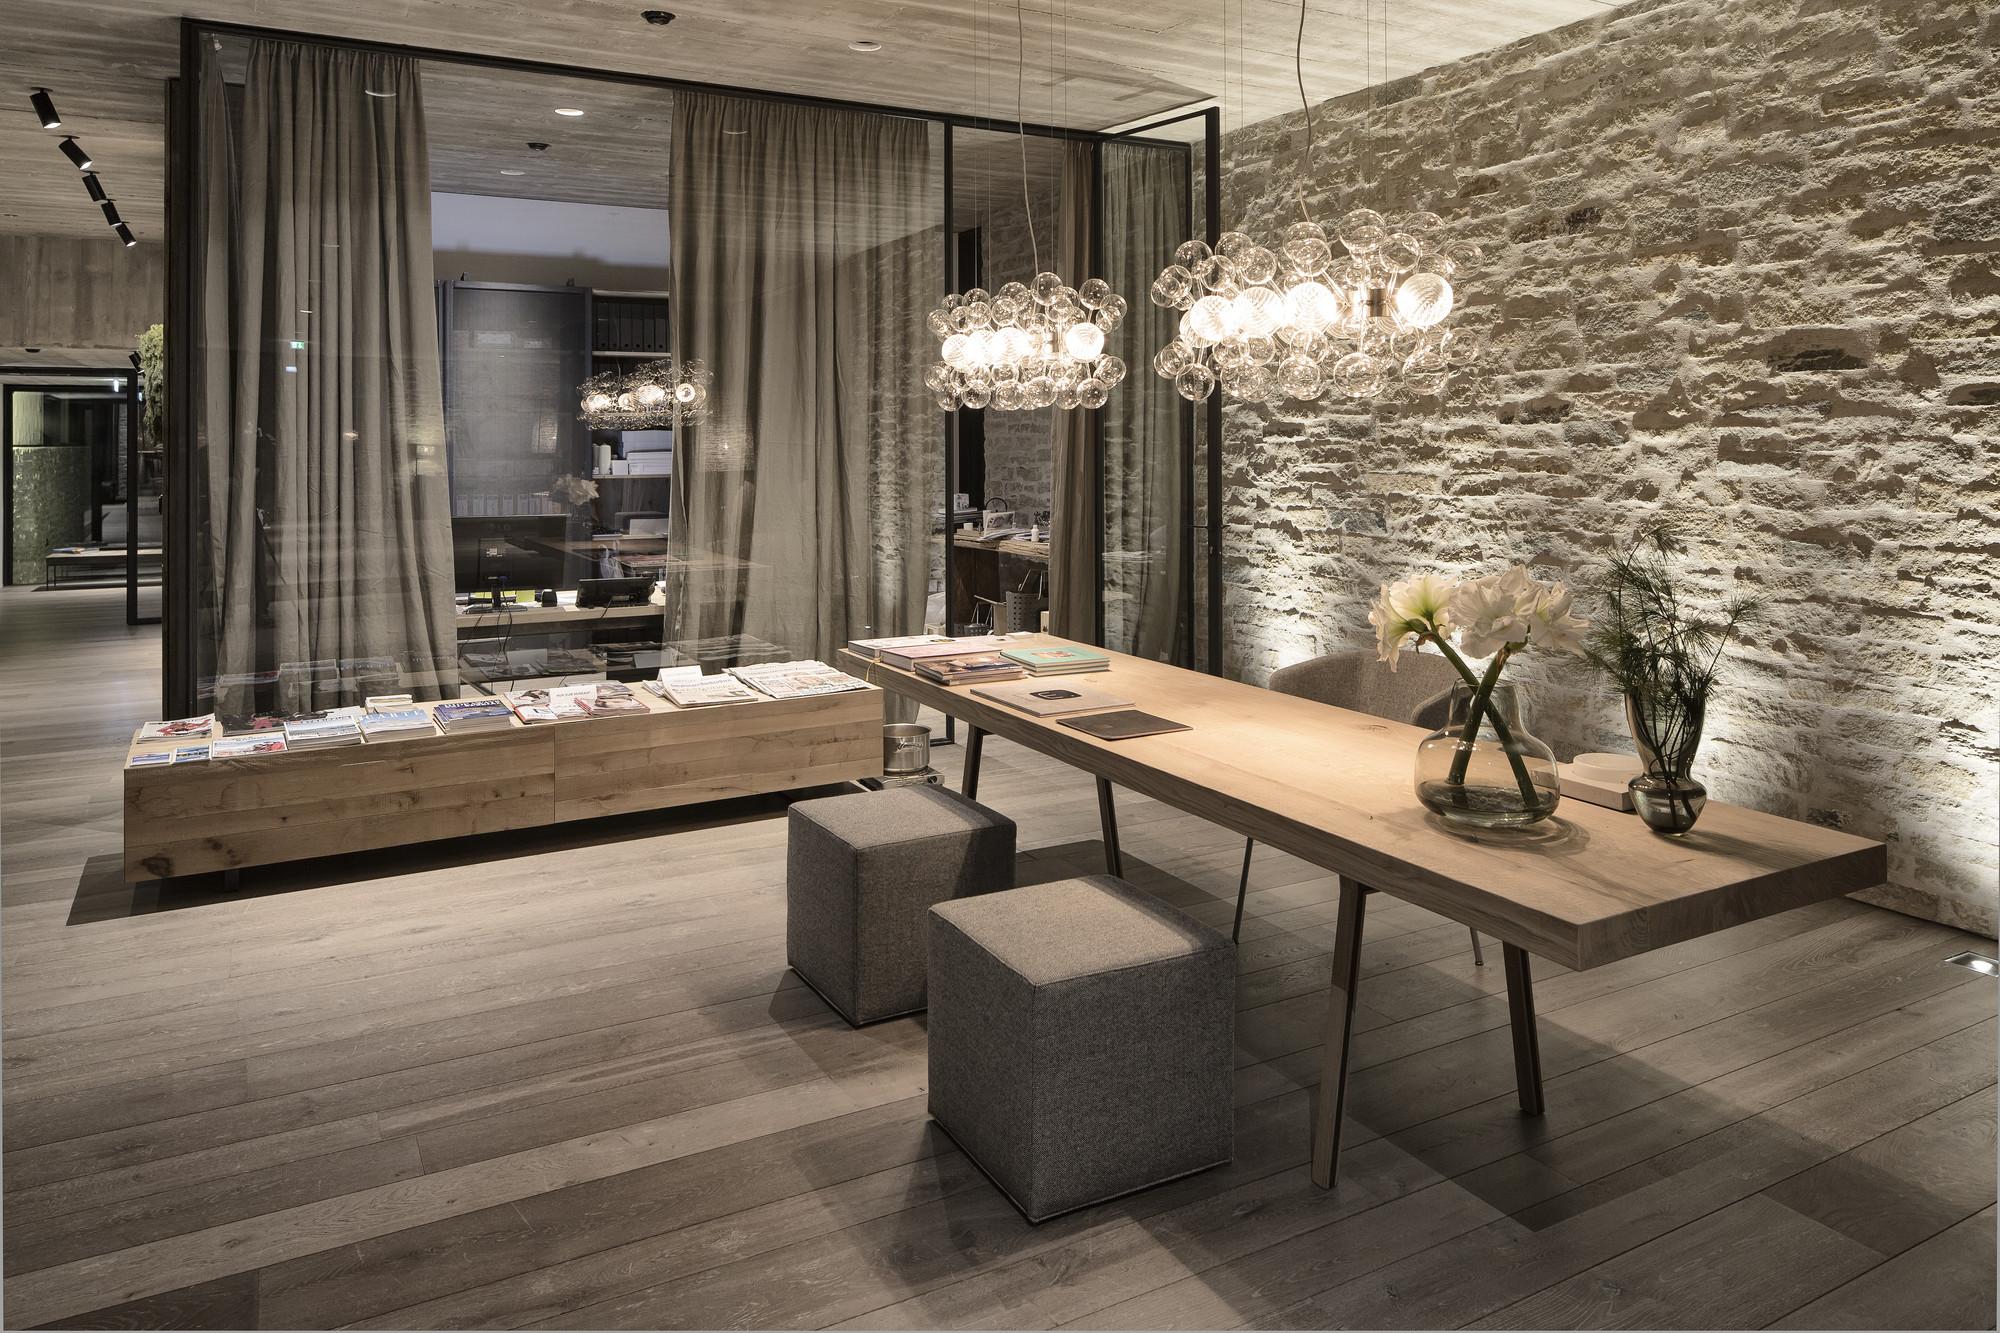 Gallery Of Hotel Wiesergut Gogl Architekten 23